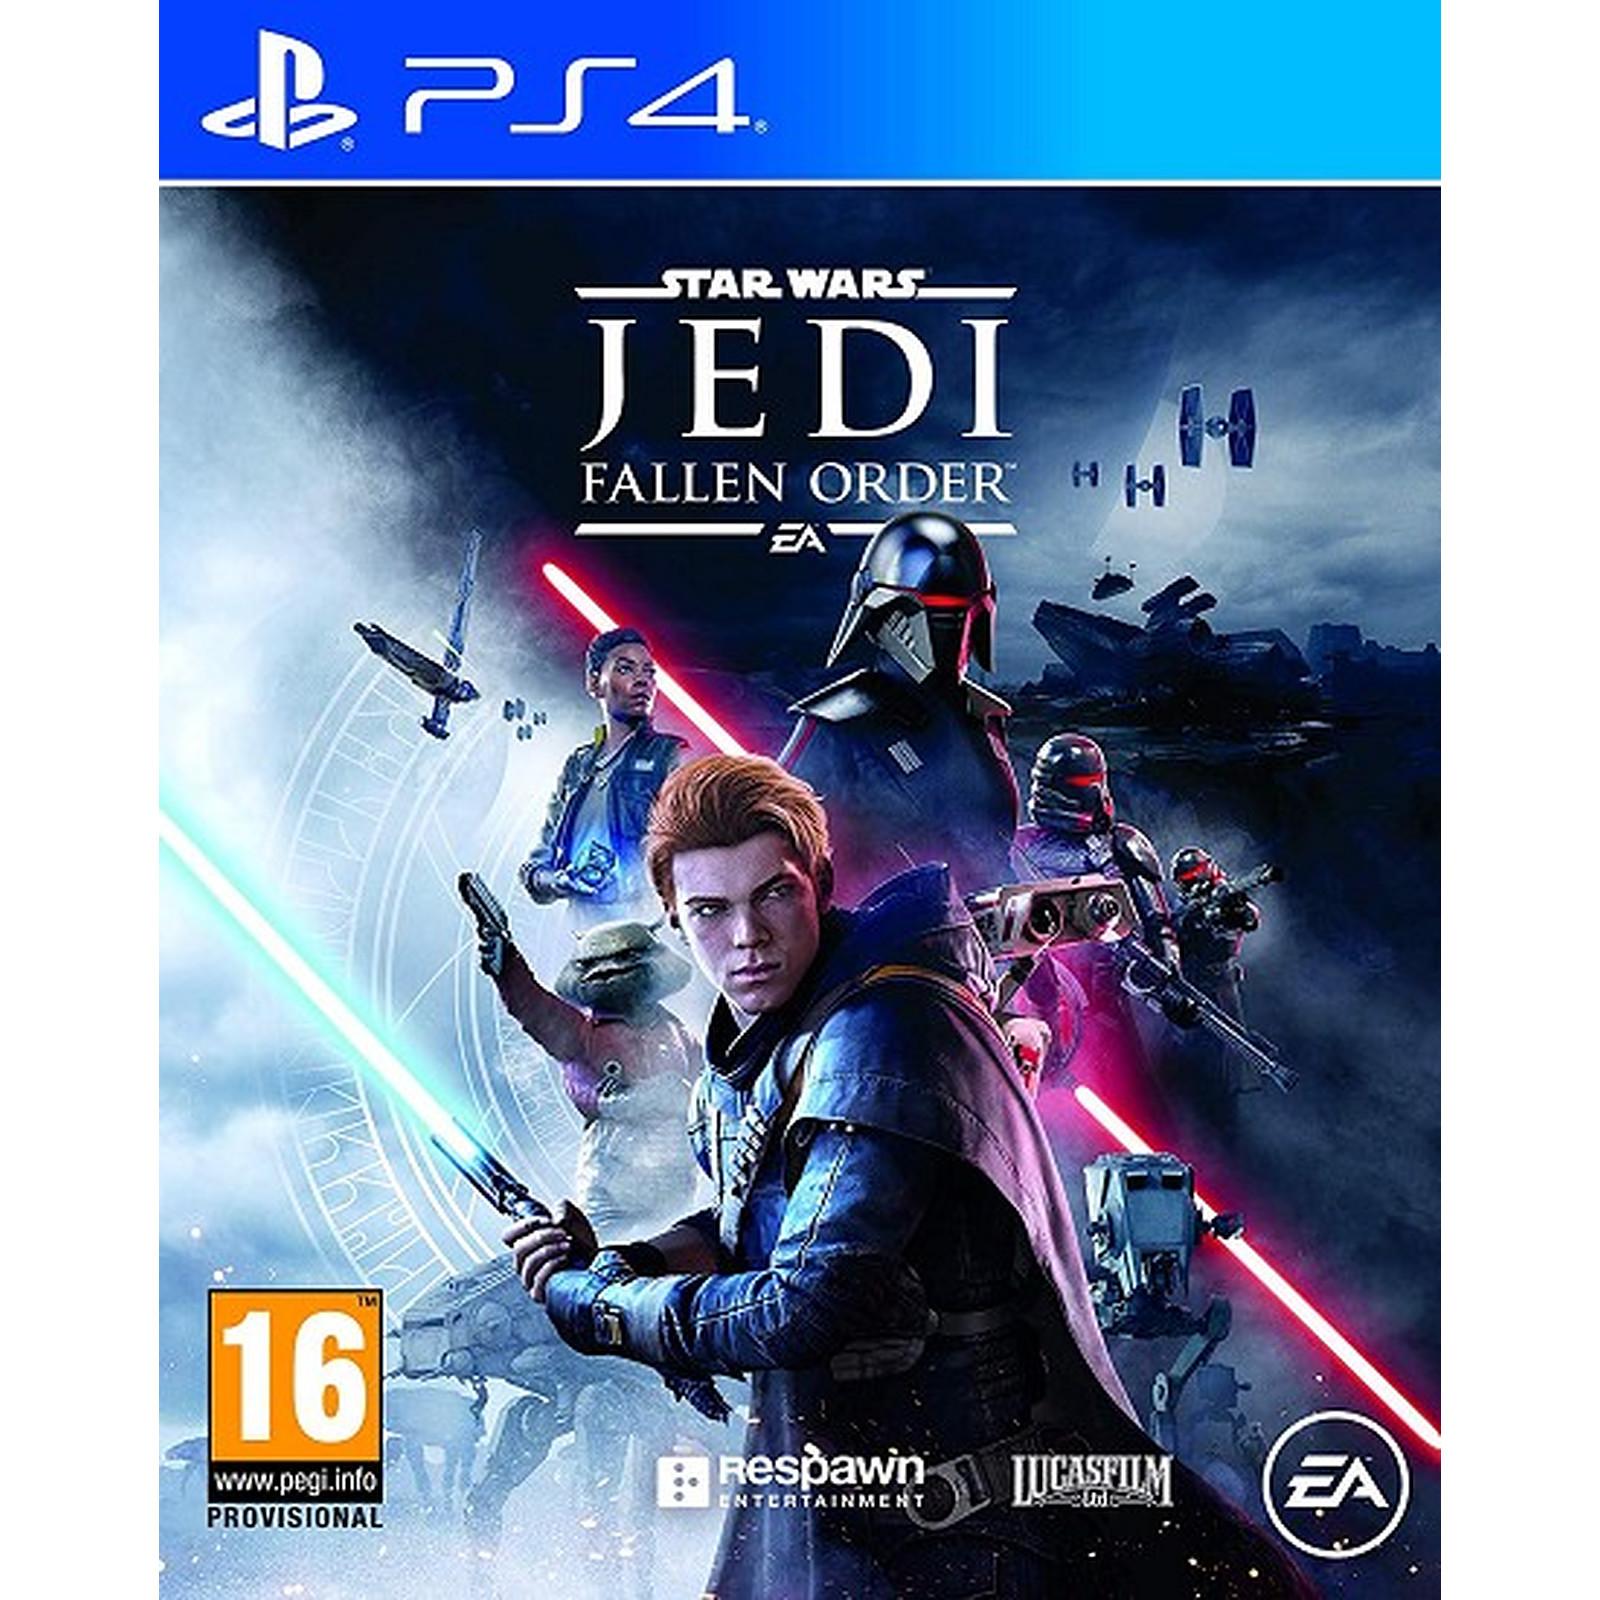 Star Wars Jedi Fallen Order (PS4)